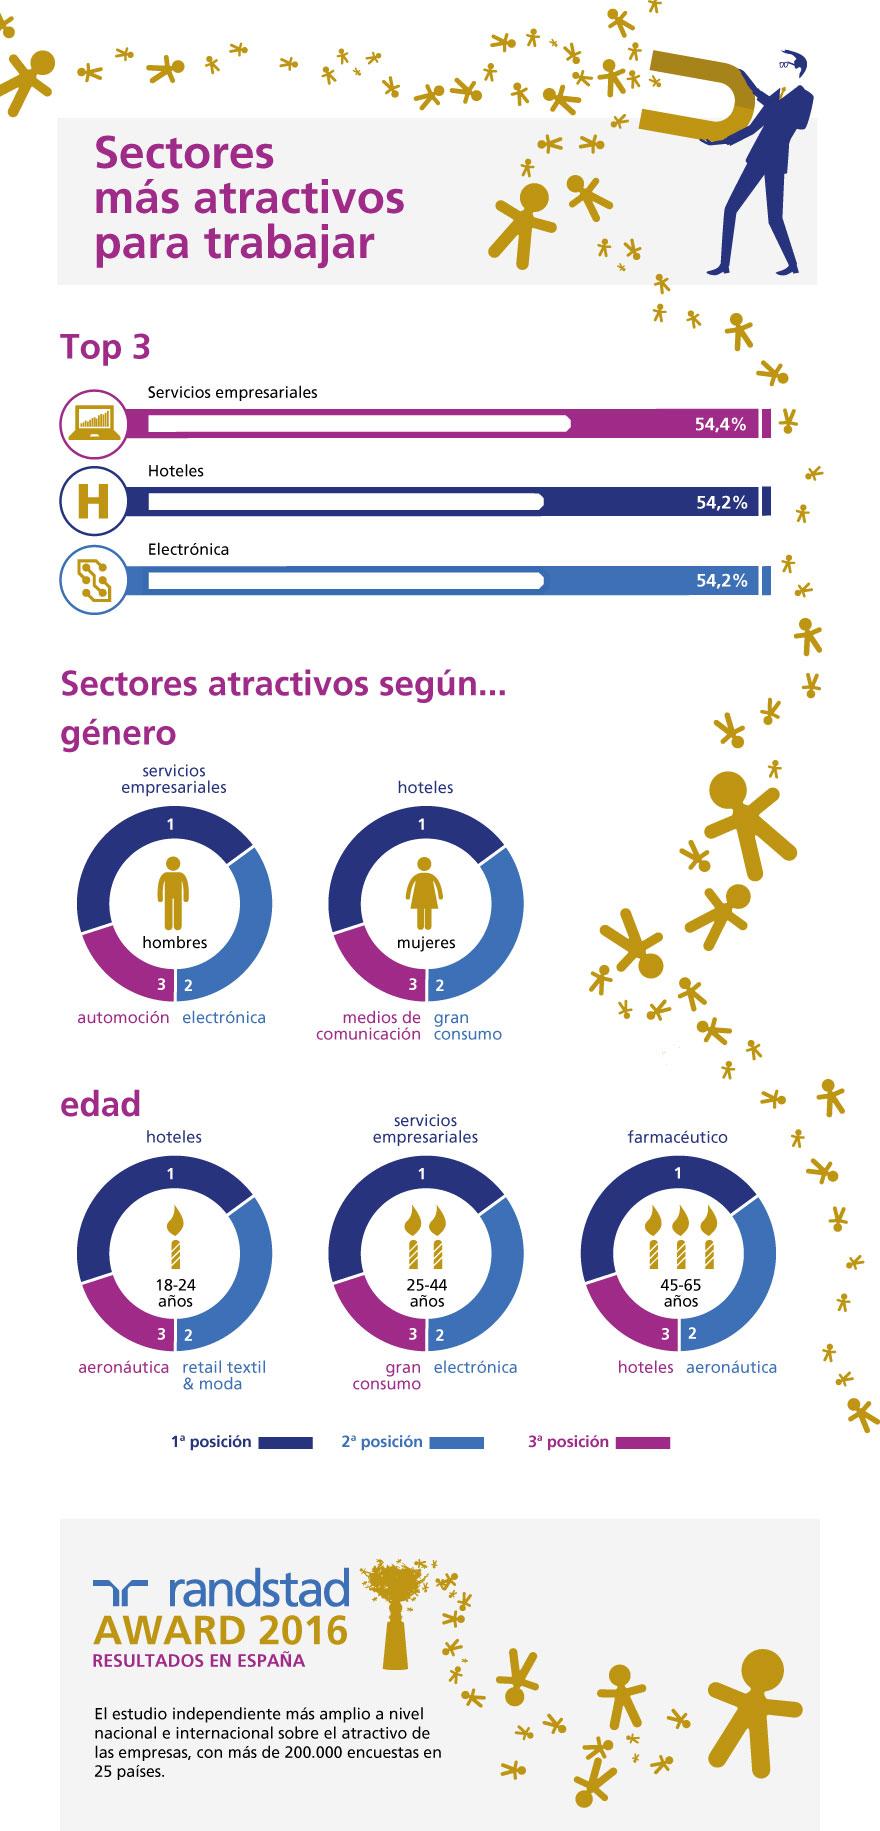 randstad-employer-branding-sectores-mas-atractivos